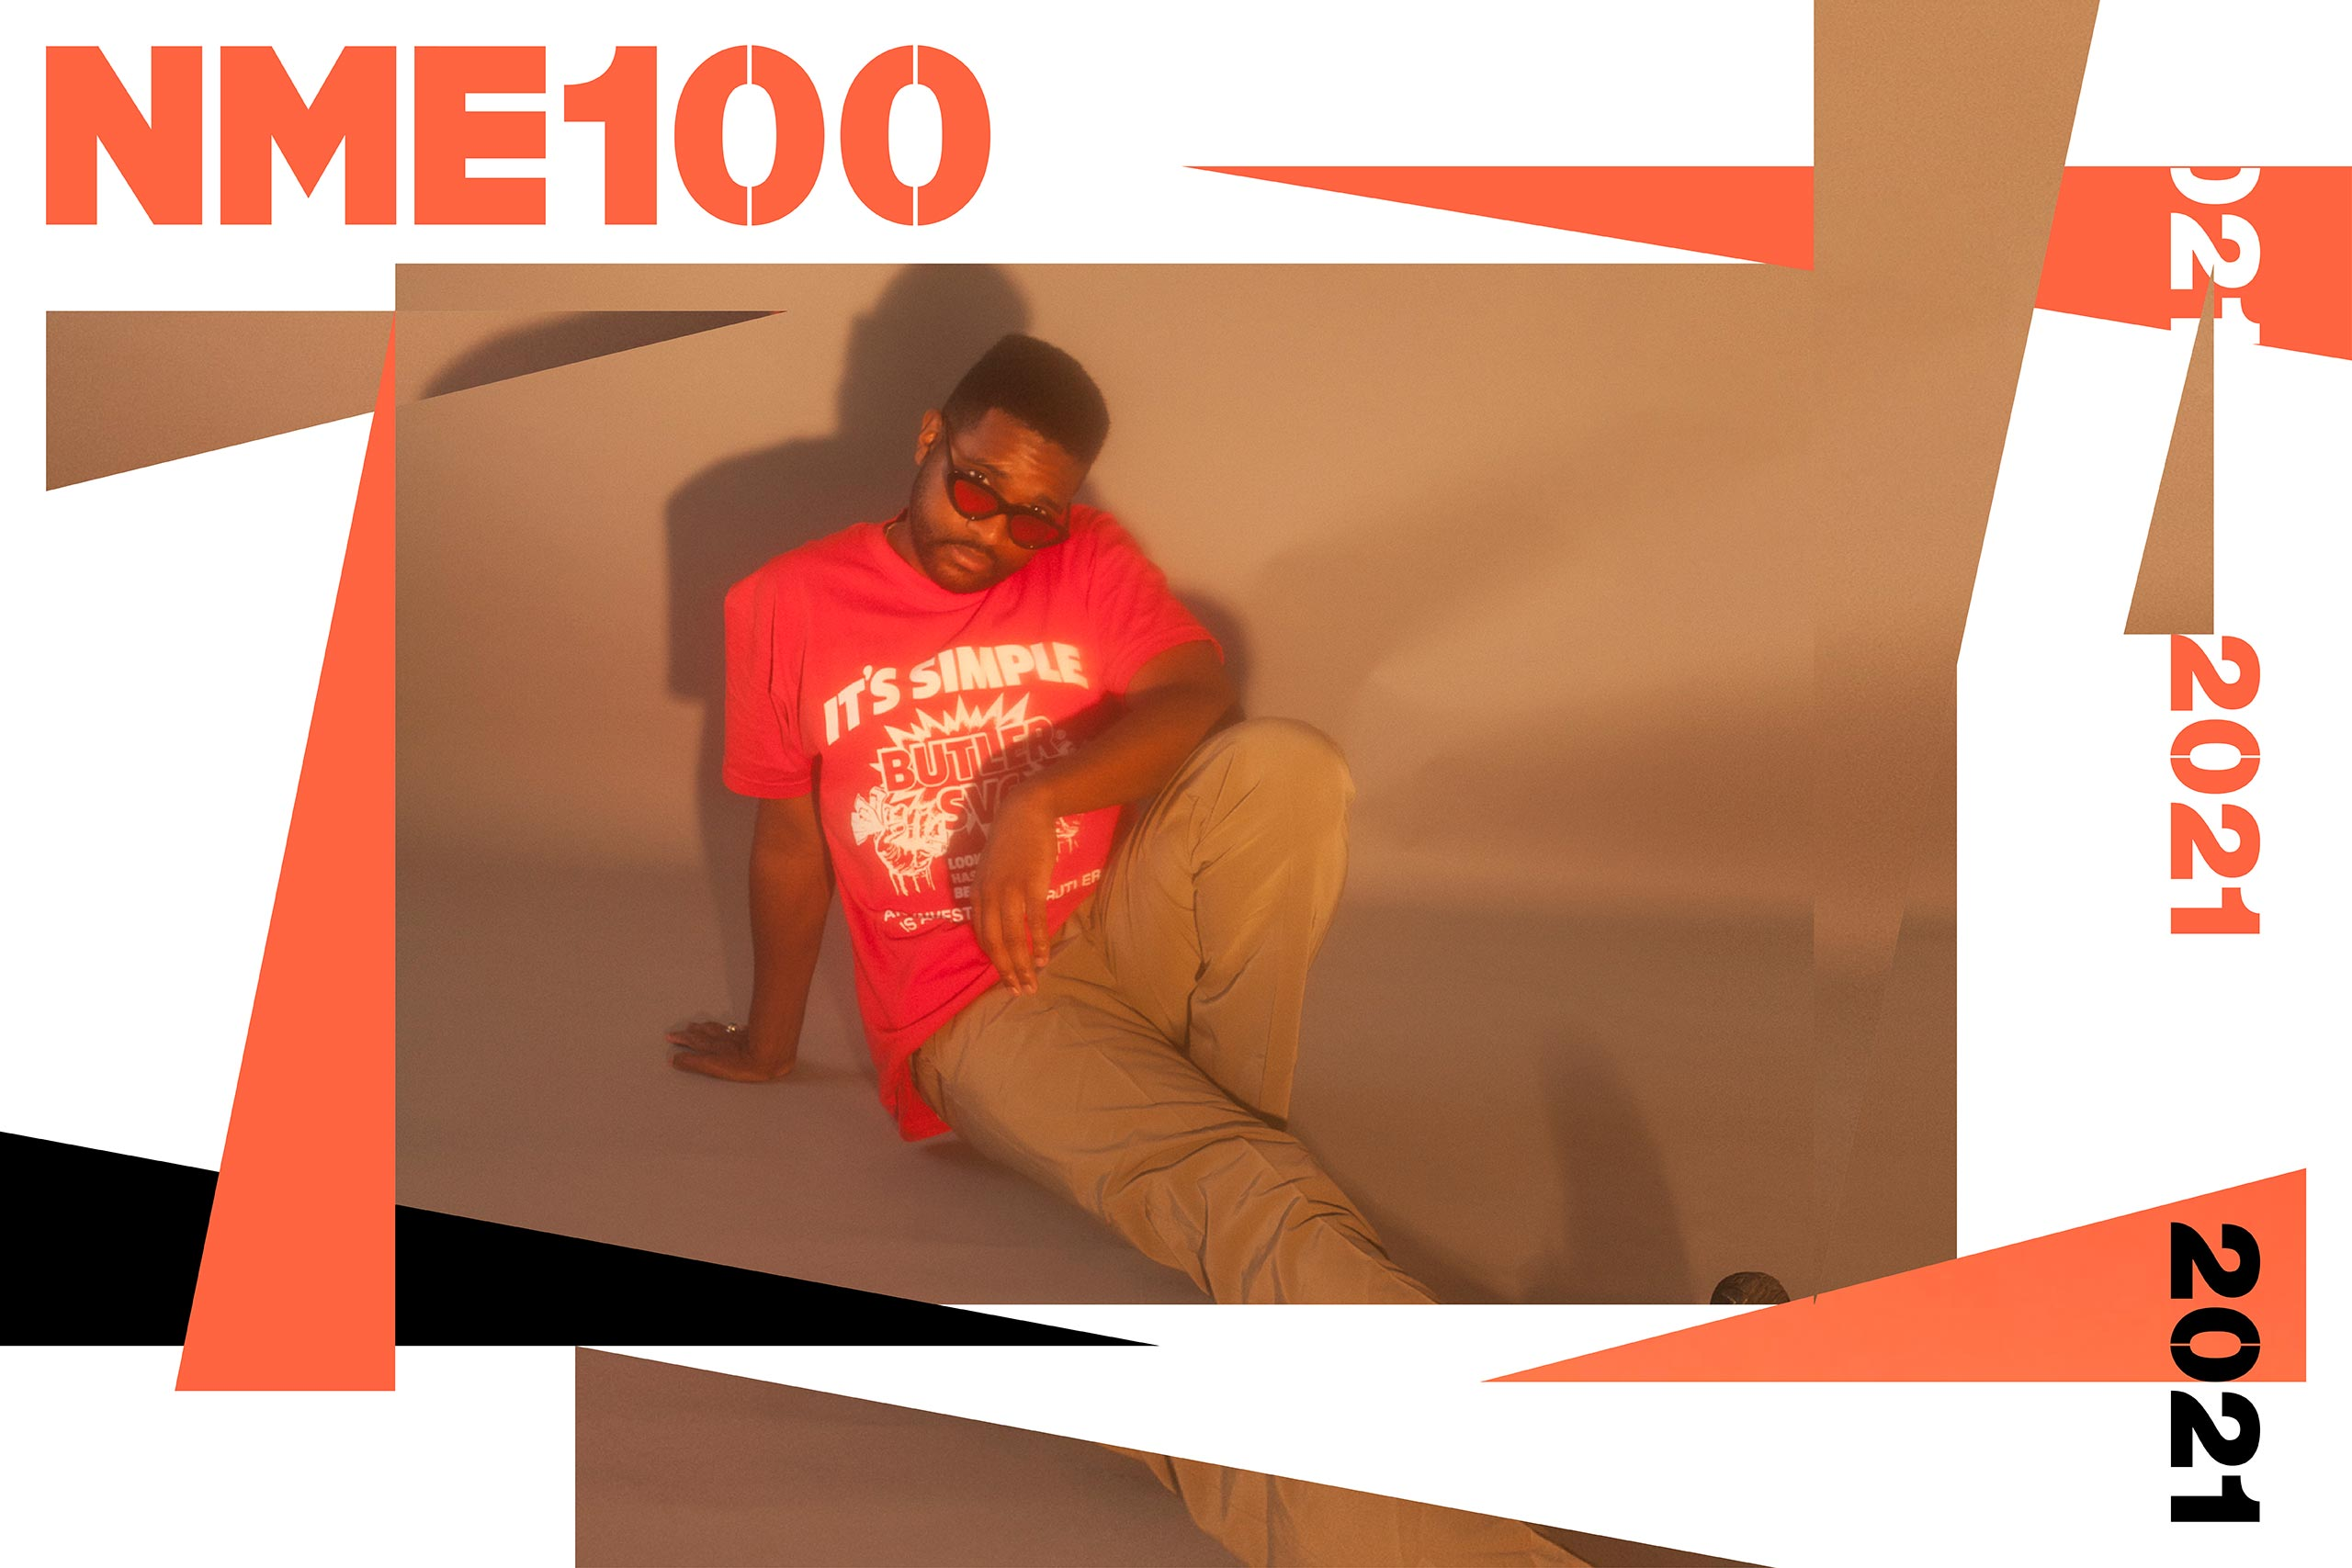 NME 100 martyn bootyspoon